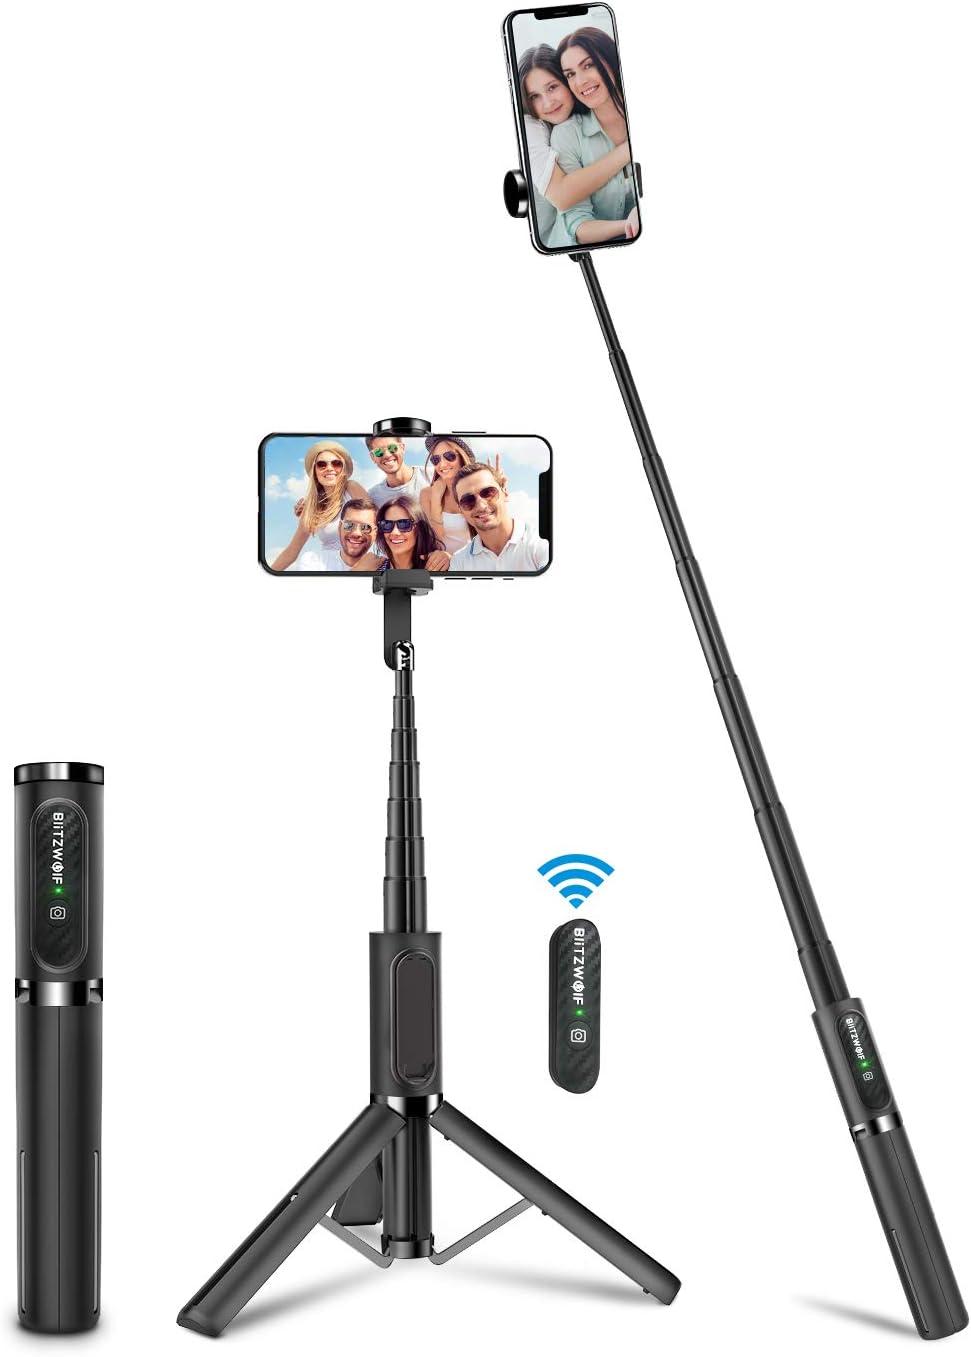 BlitzWolf Palo Selfie Trípode con Control Remoto Bluetooth, Selfie Stick Extensible de Aluminio para iPhone XS MAX/XR/XS/X/8/8P/7/7P/6, Galaxy S10/S9/S8/S7, Huawei, Xiaomi y etc.(Gris)